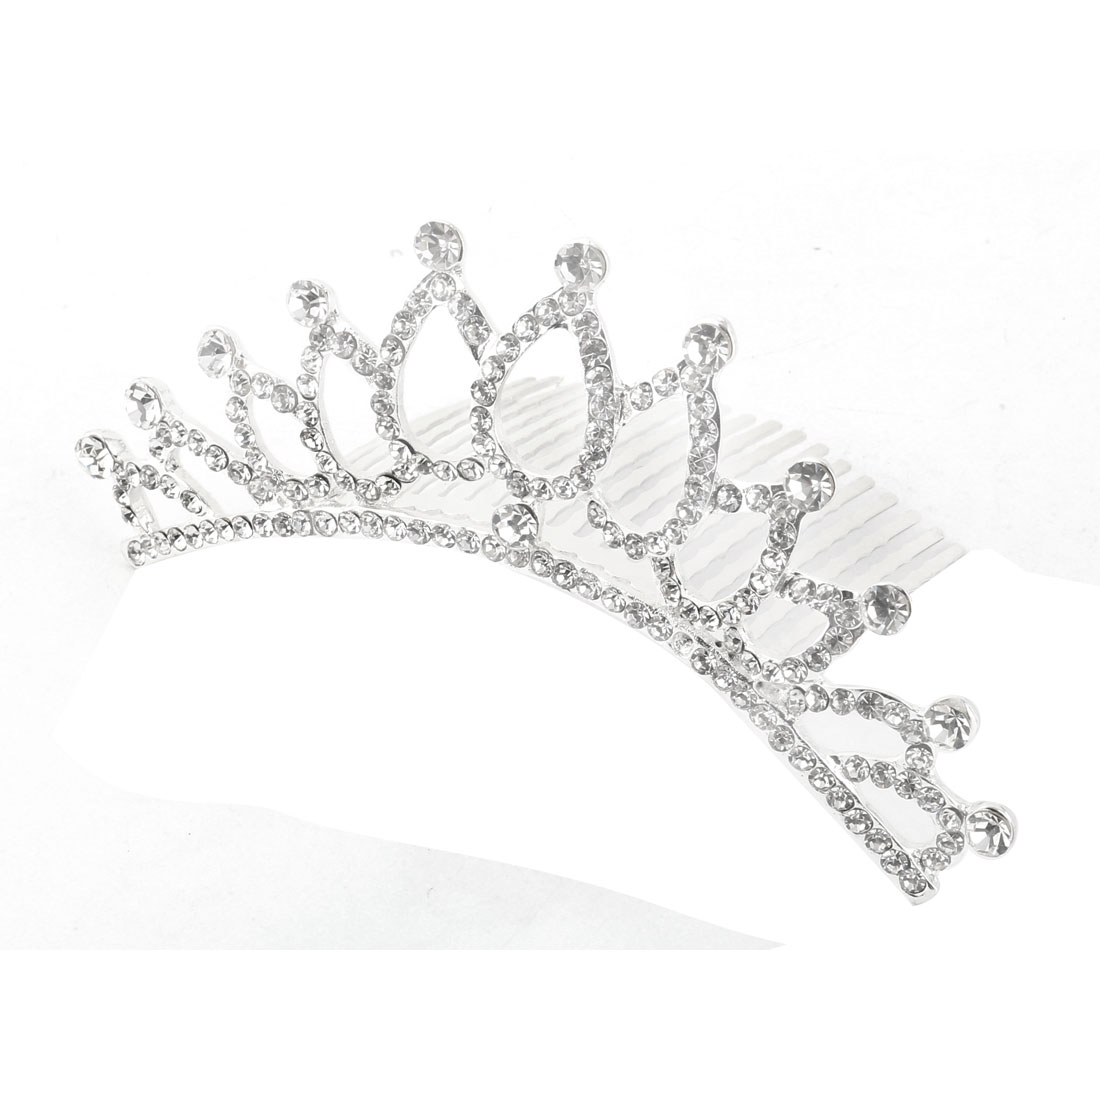 Ladies Party Rhinestone Decor Shining Bridal Crown Hair Comb Tiara Headpiece